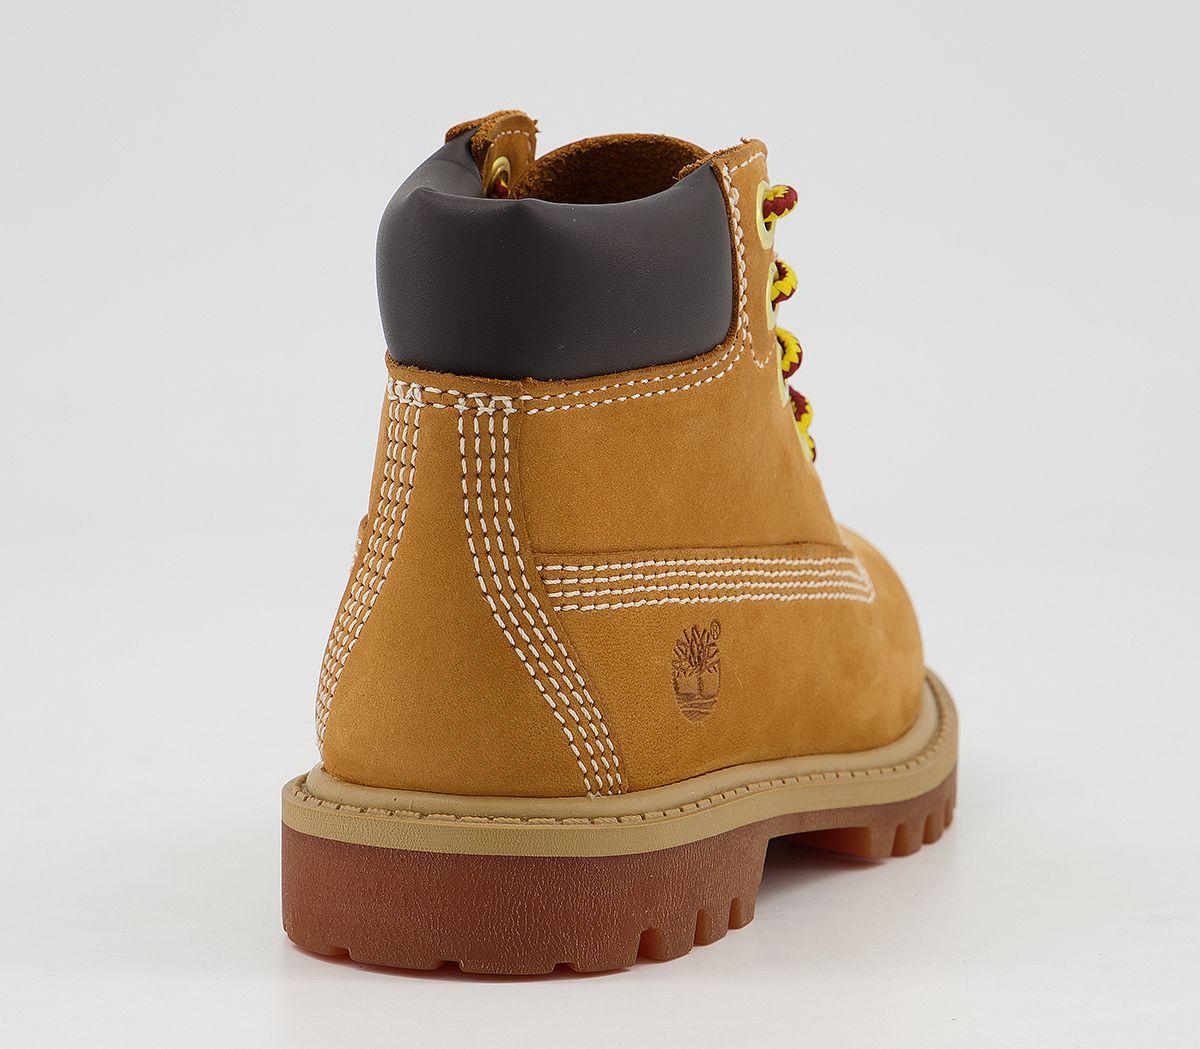 df6ced896c863e Sentinel Kids Timberland 6 Inch Classic Boots Infant Wheat Nubuck Kids